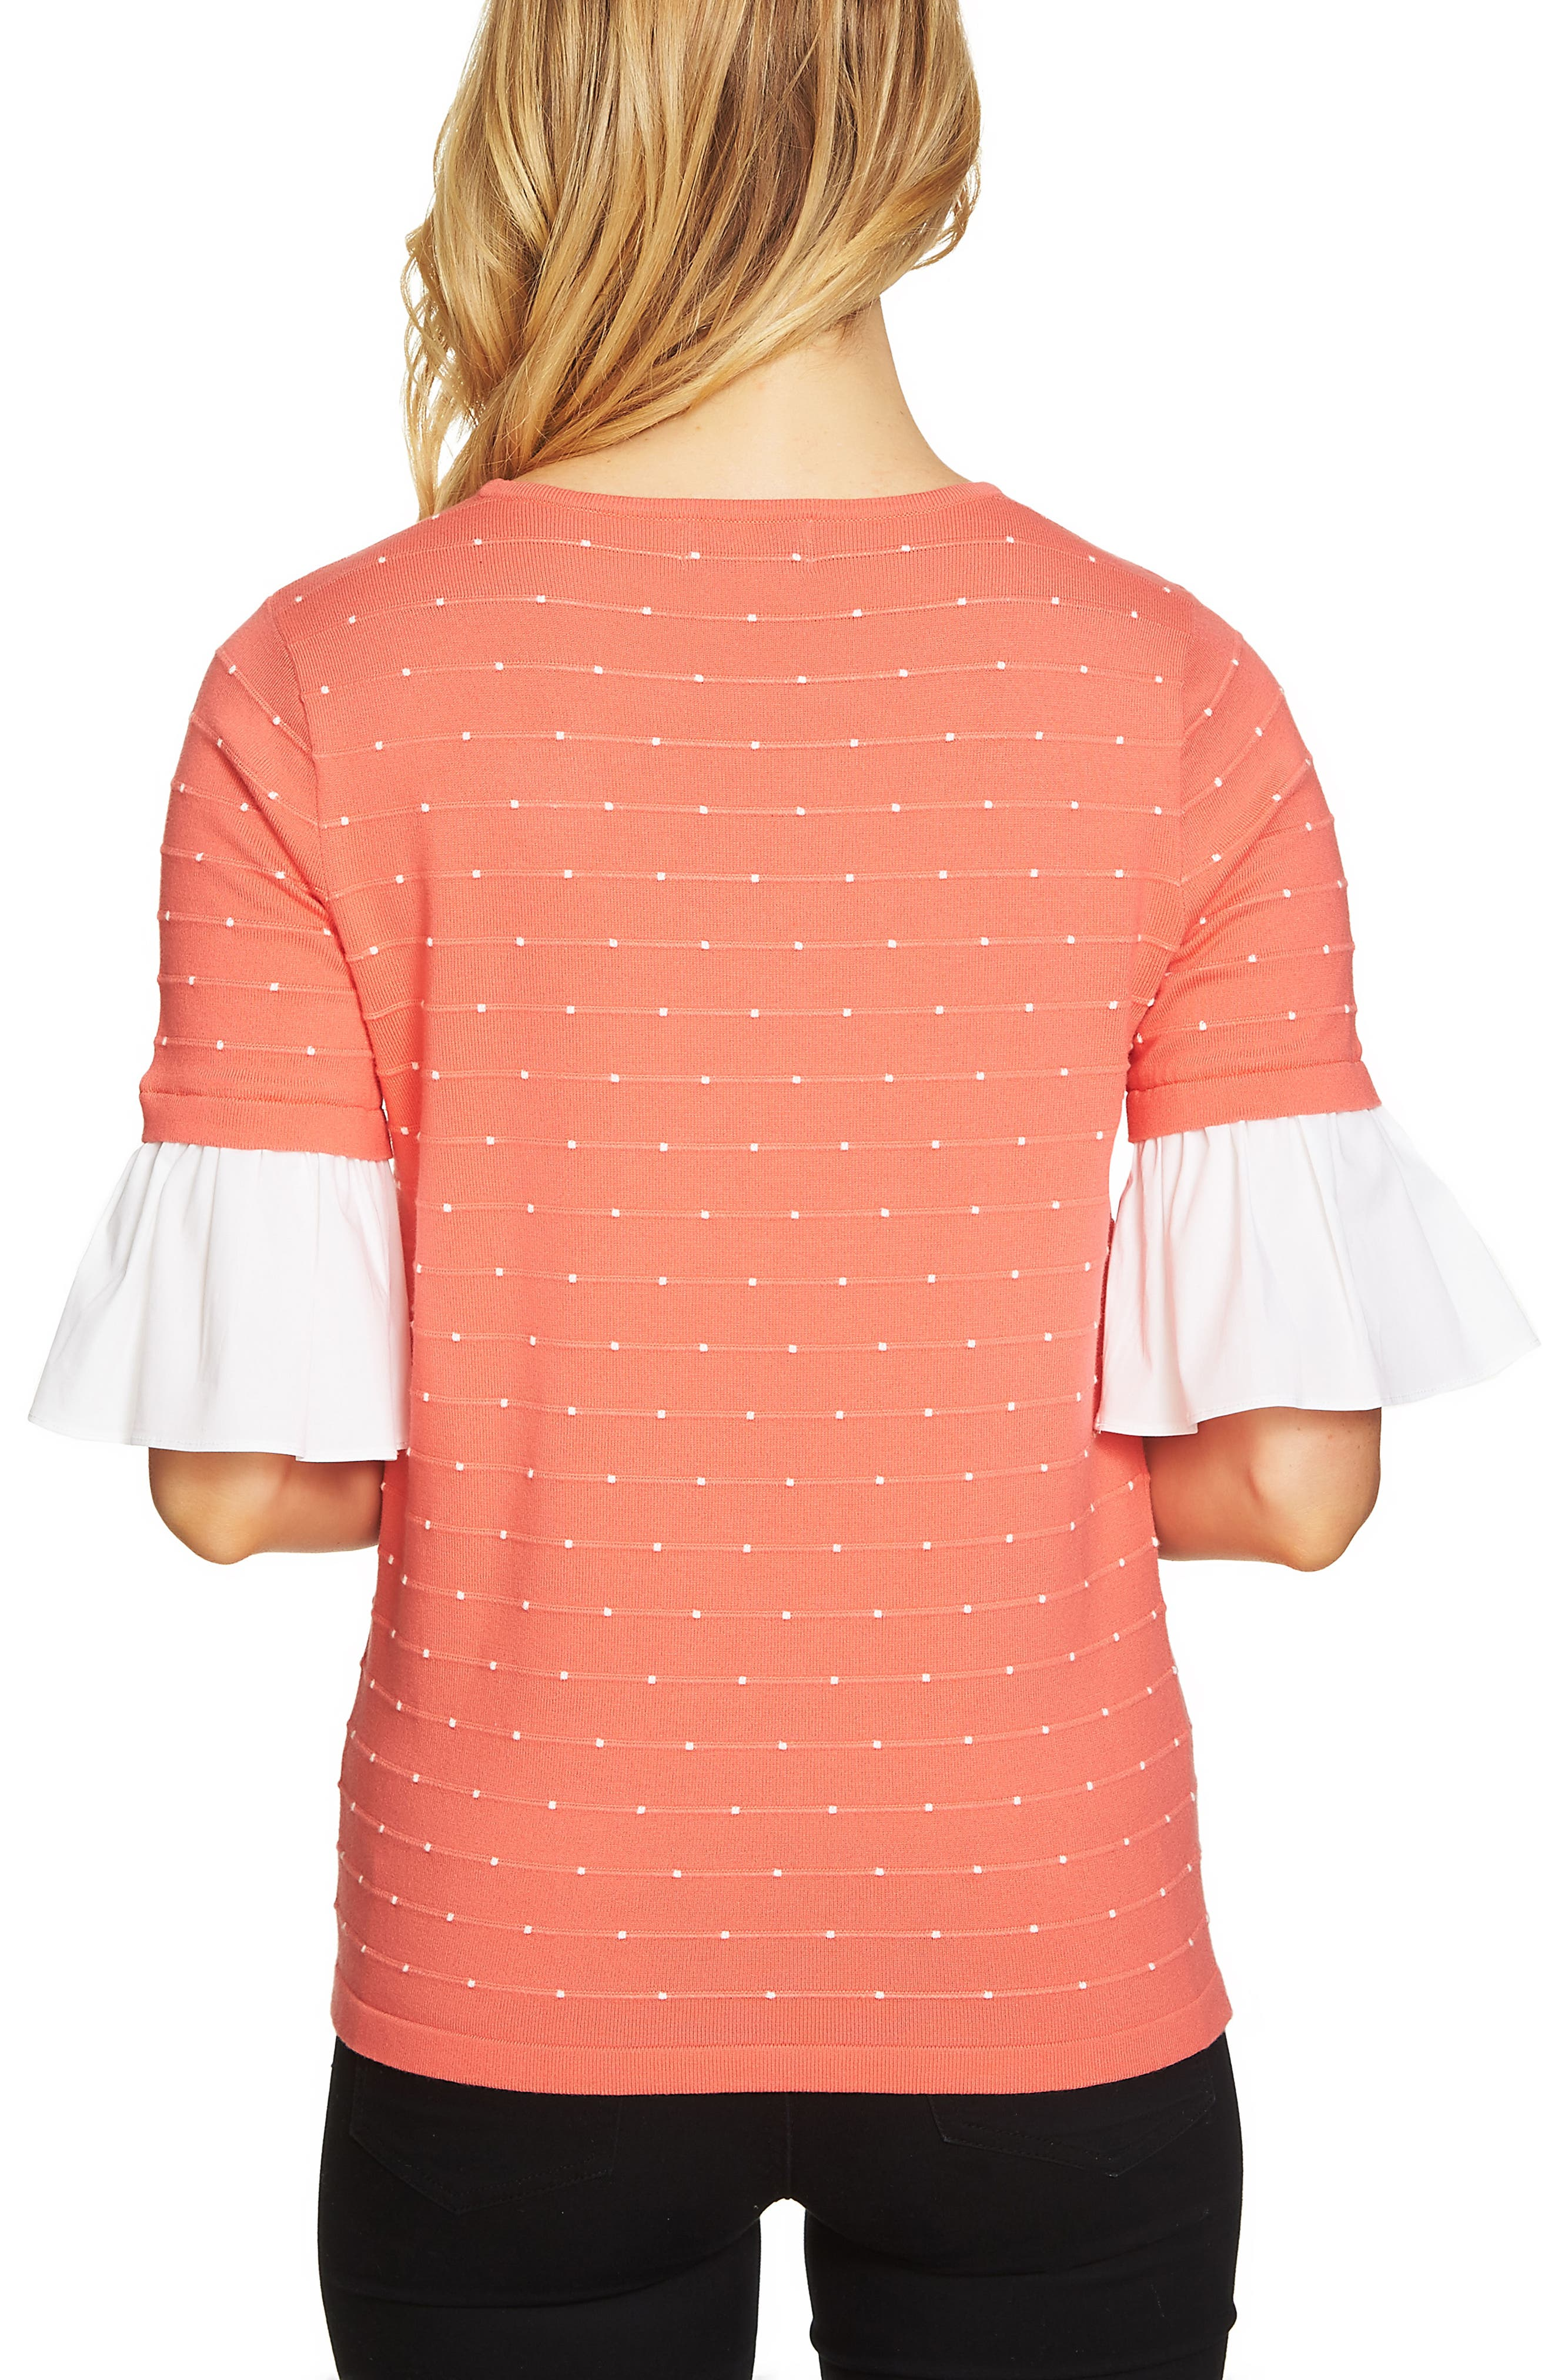 Ruffle Sleeve Jacquard Sweater,                             Alternate thumbnail 2, color,                             Coral Jewel